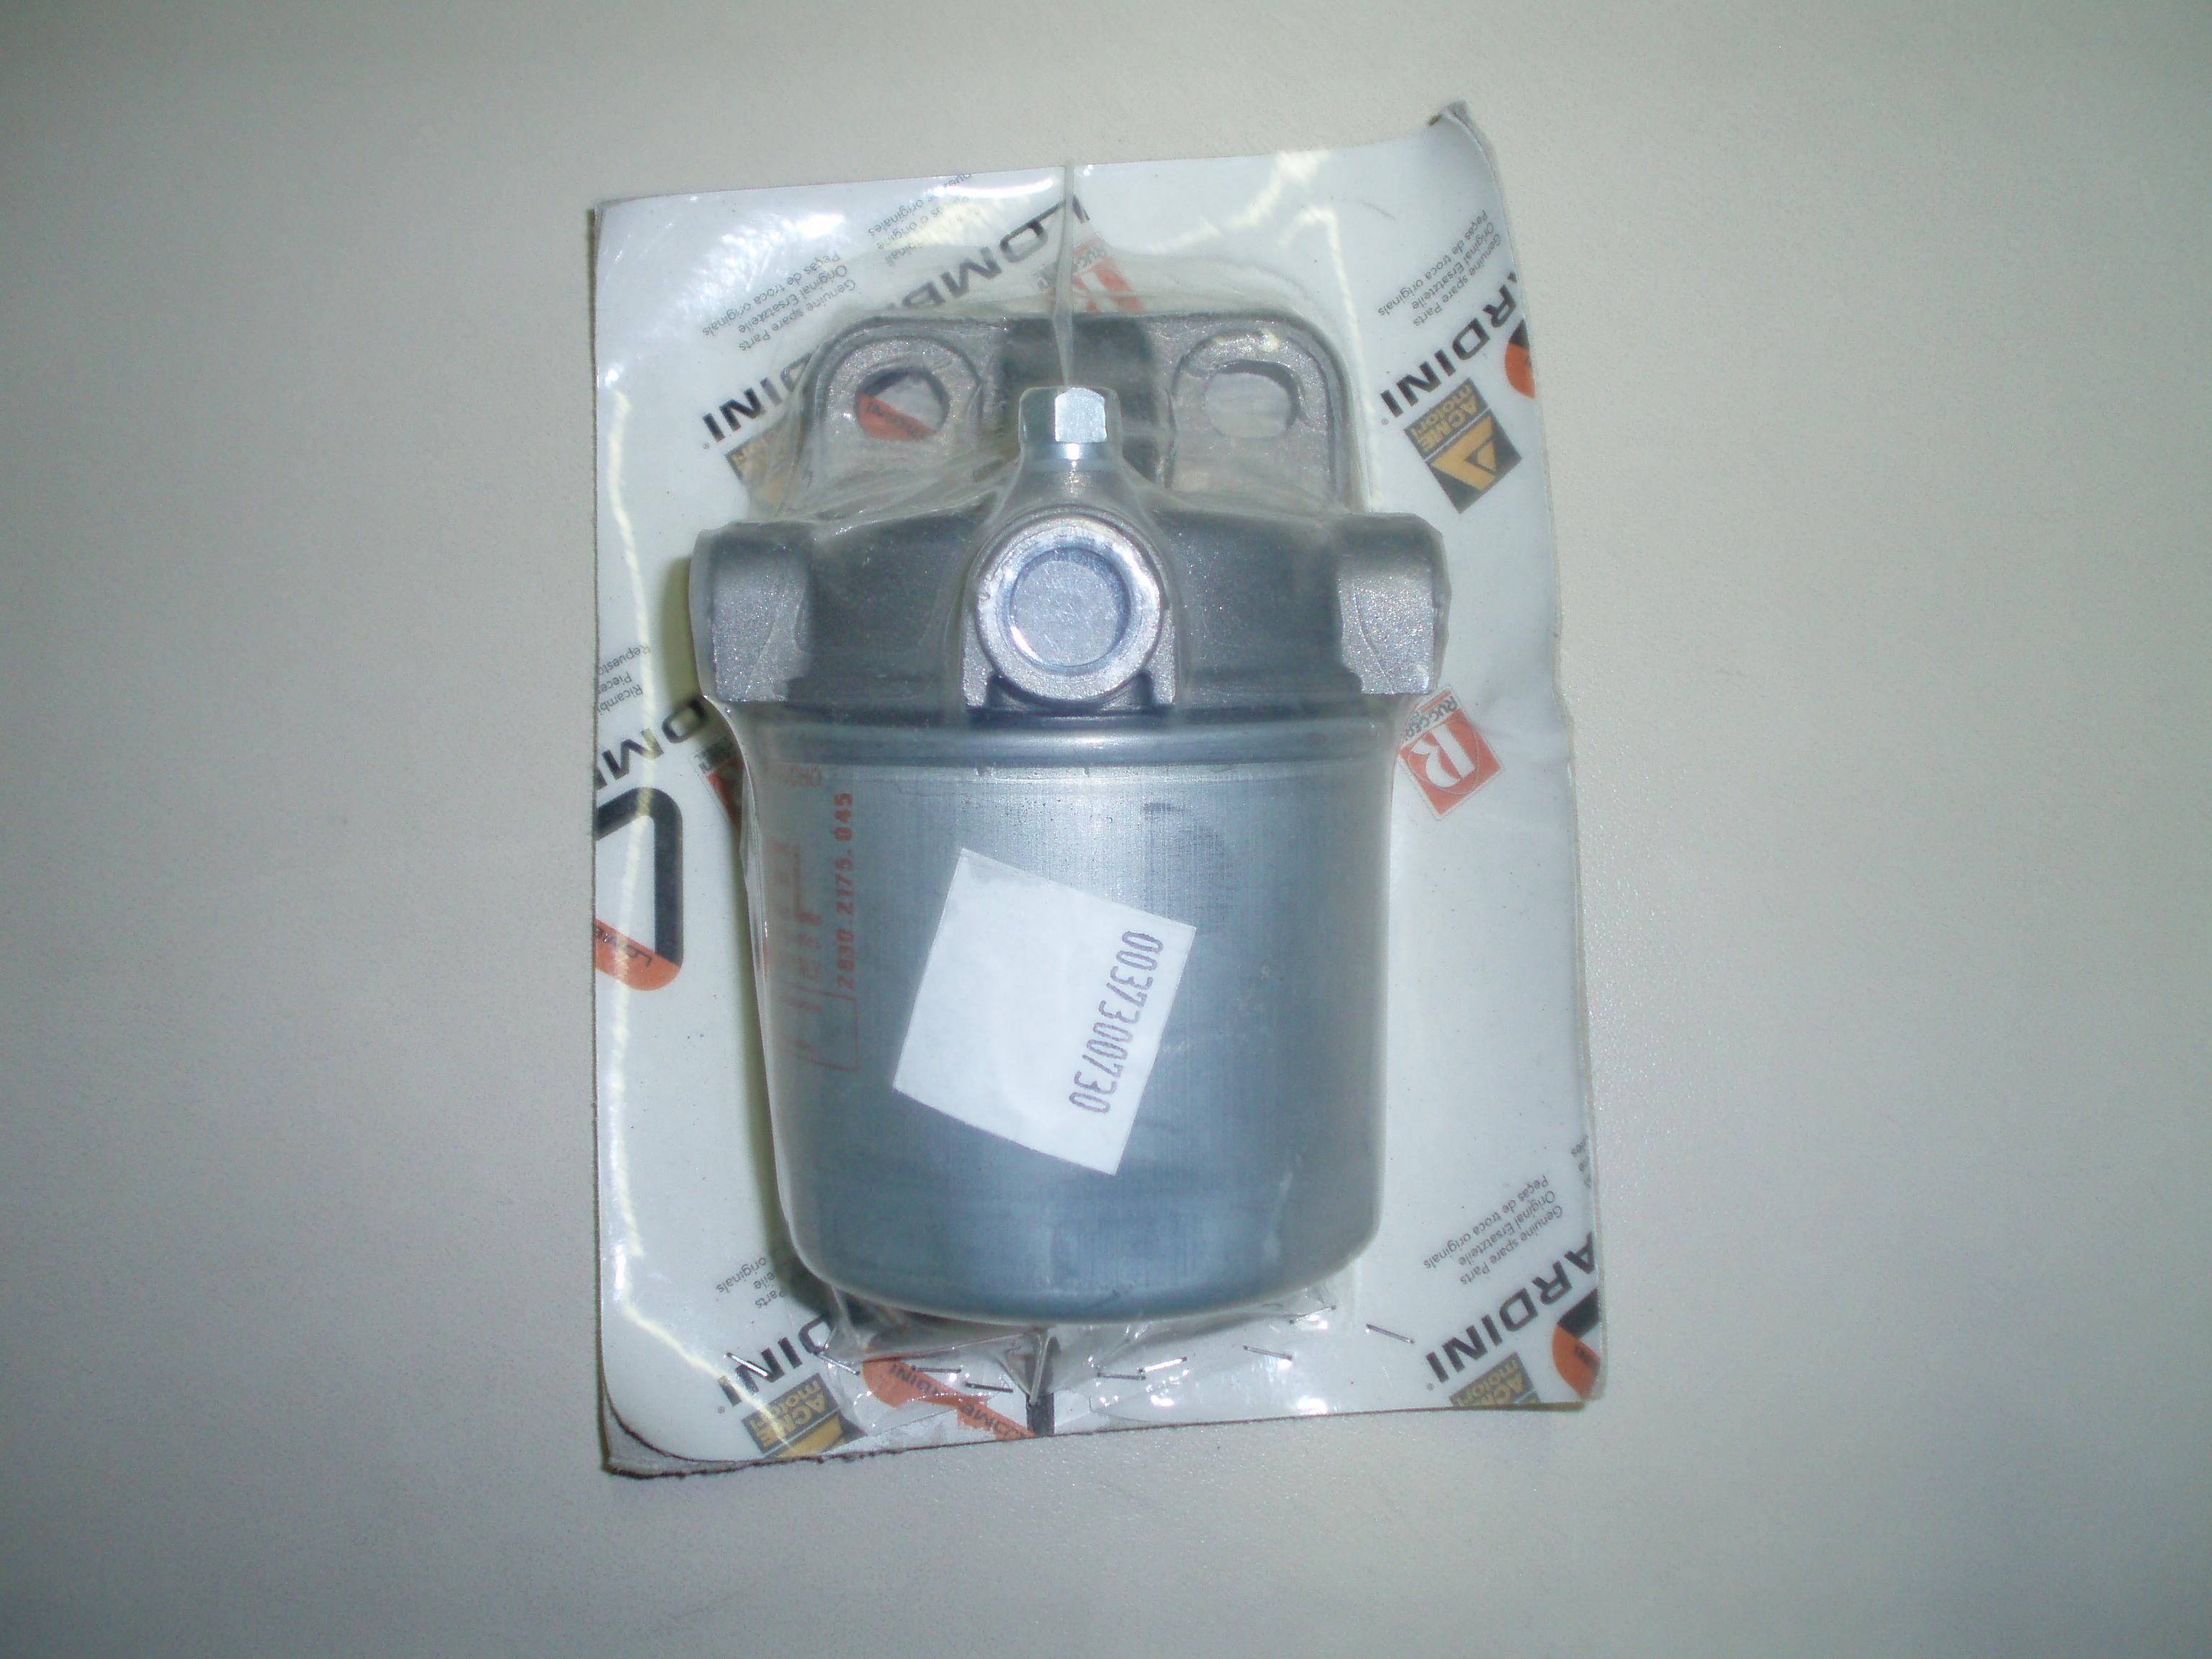 Filtre gasoil complet 15LD225 15LD315 15LD350 FOCS LDW502 LDW602 LDW702 LDW903 LDW1204 LOMBARDINI [3730073]